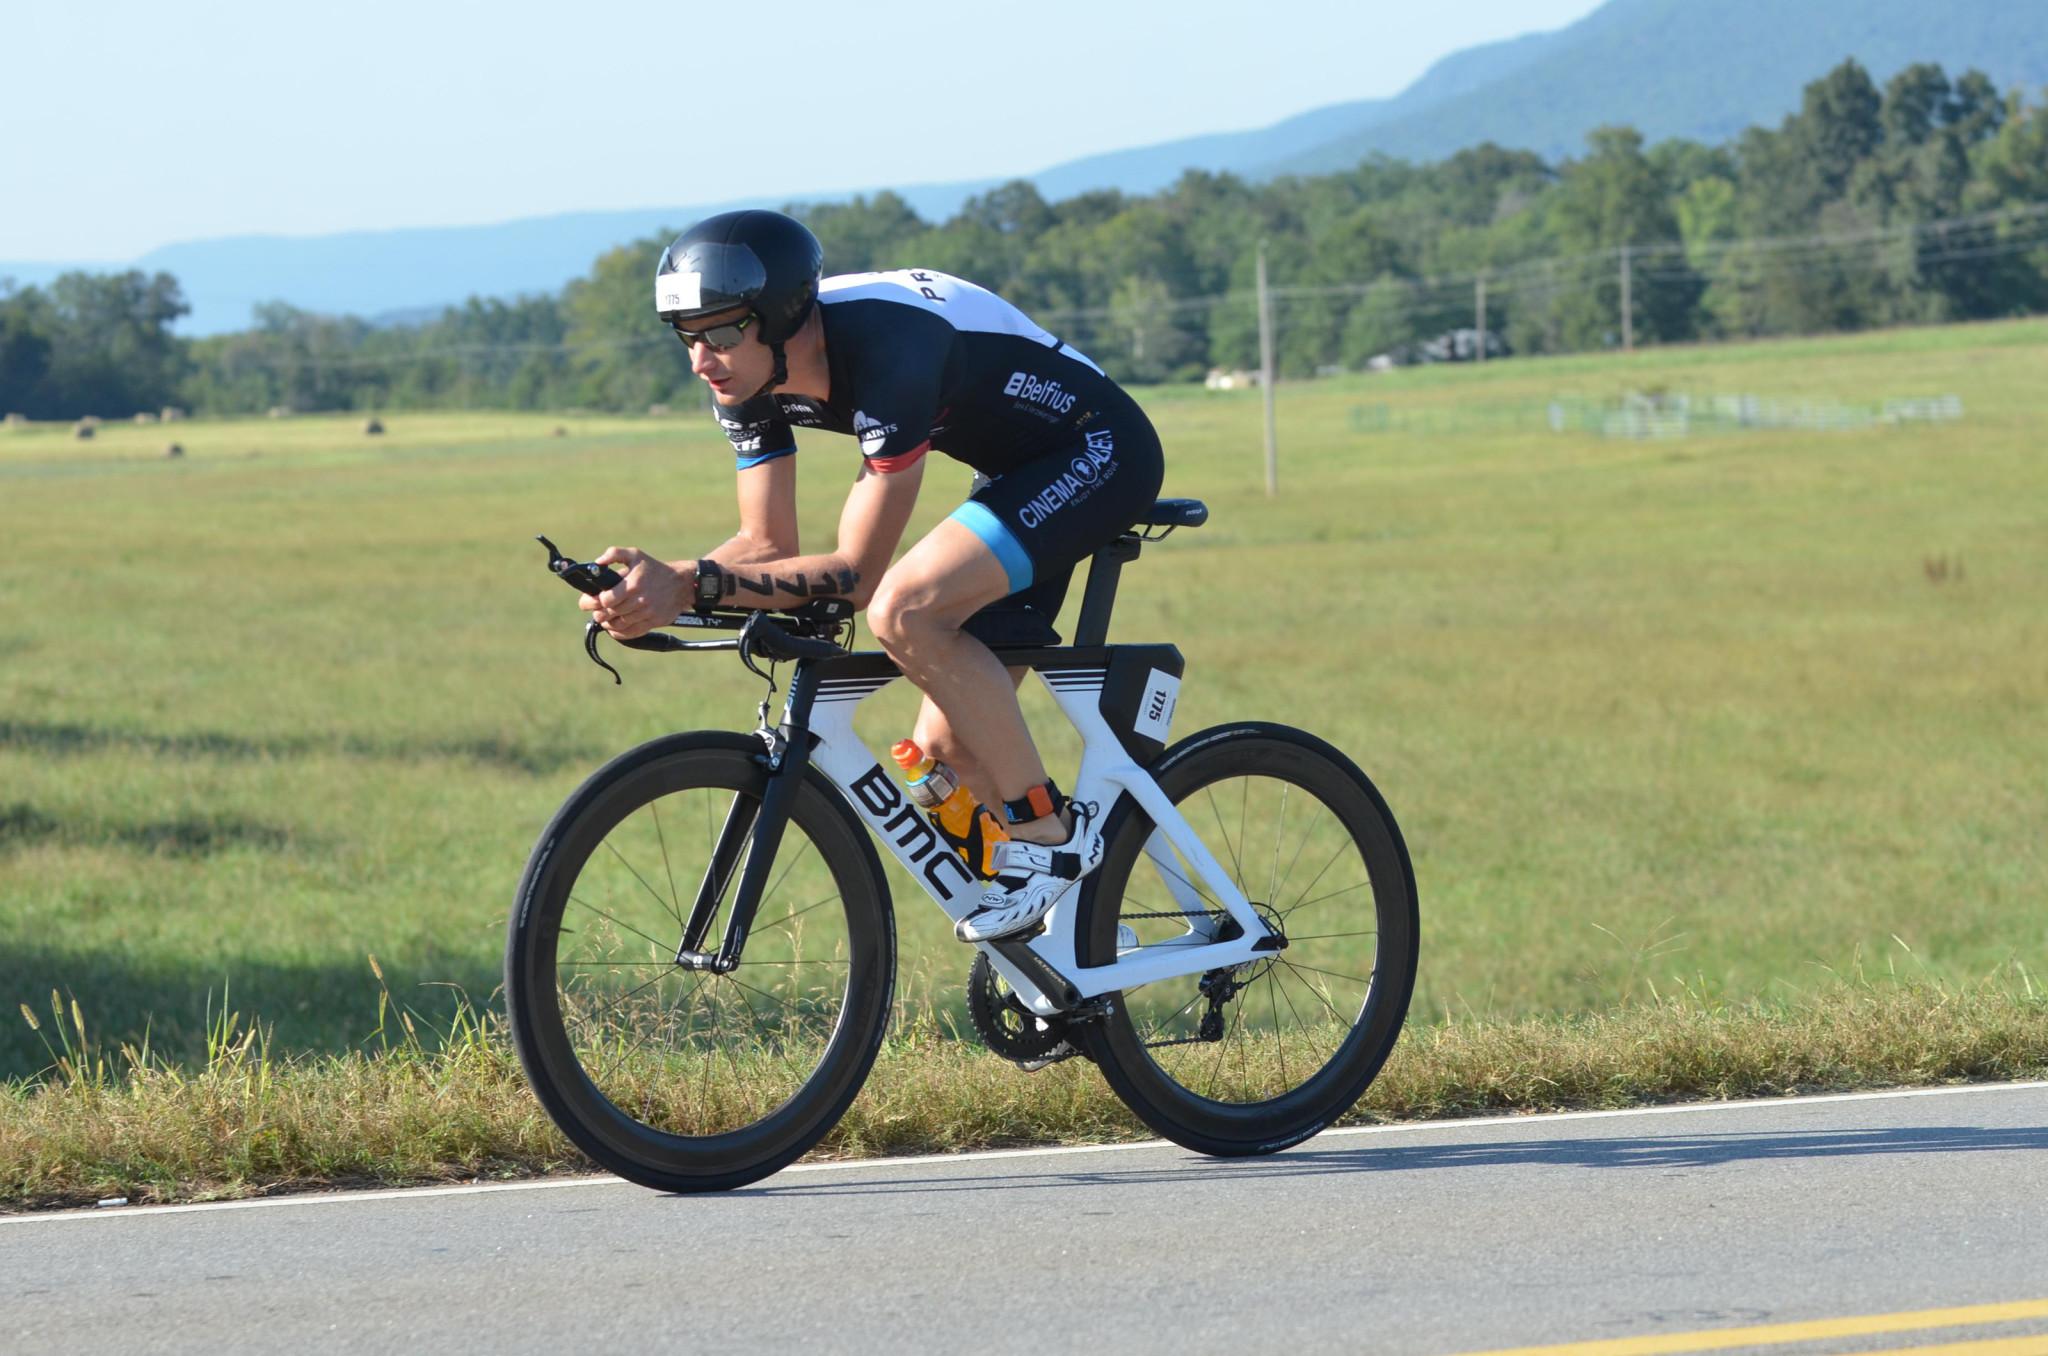 Delbeke Chattanooga Bike 1